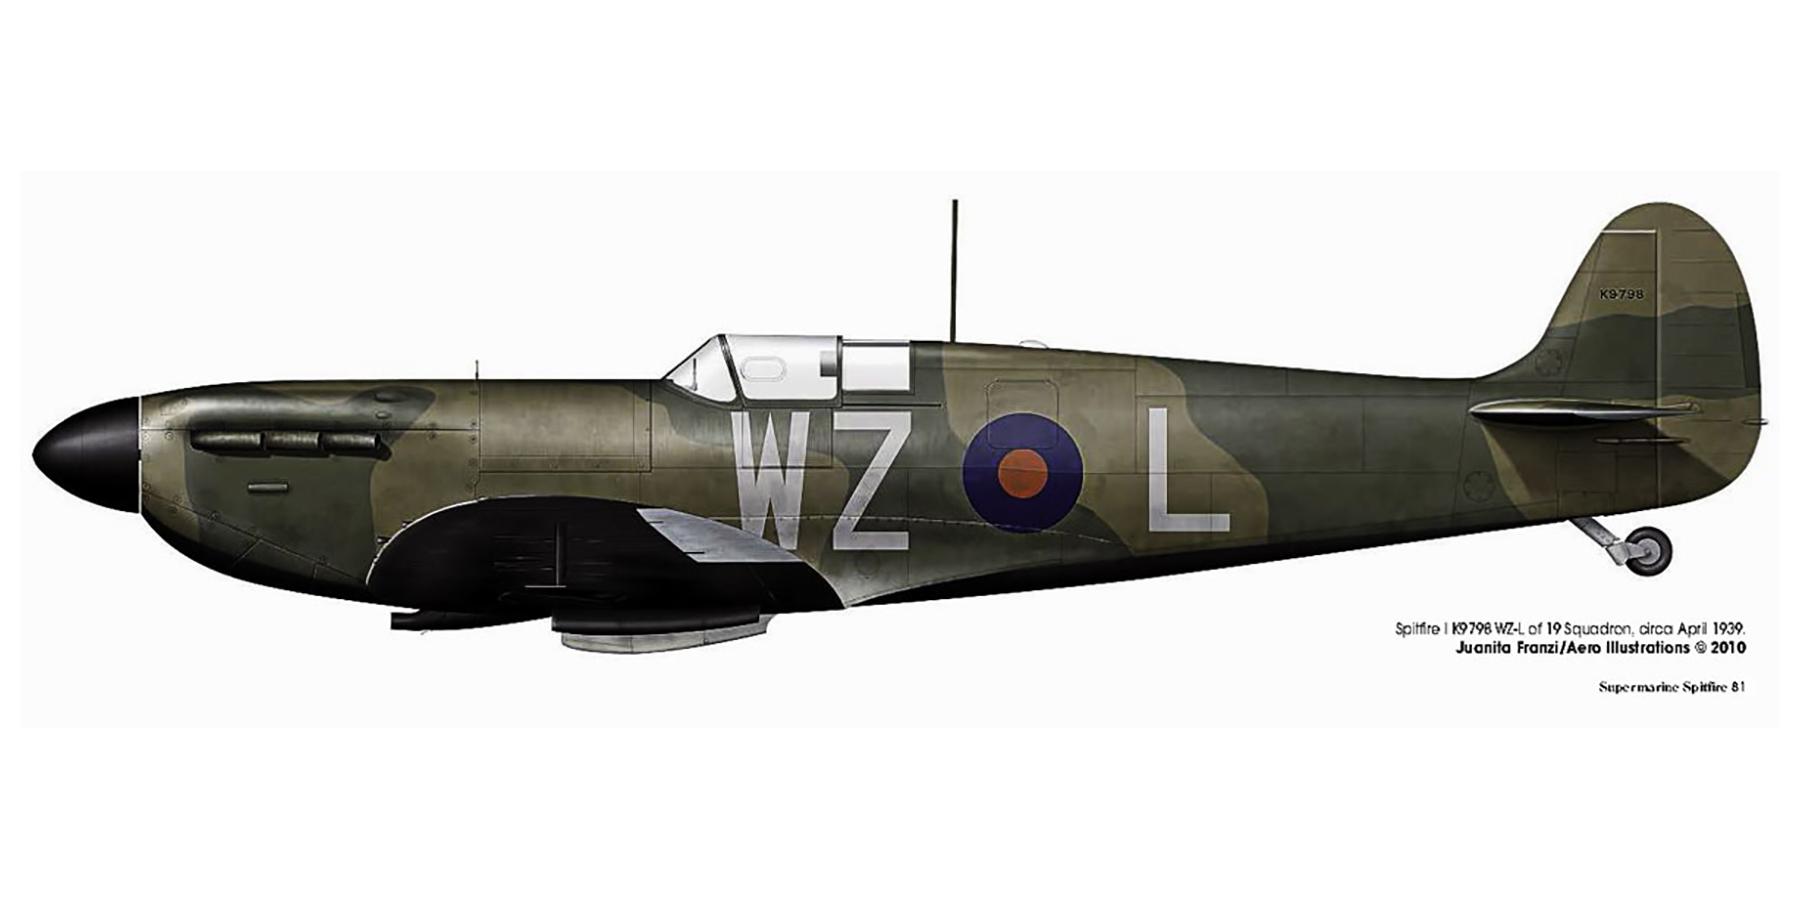 Spitfire MkI RAF 19Sqn WZL K9798 England April 1939 0A